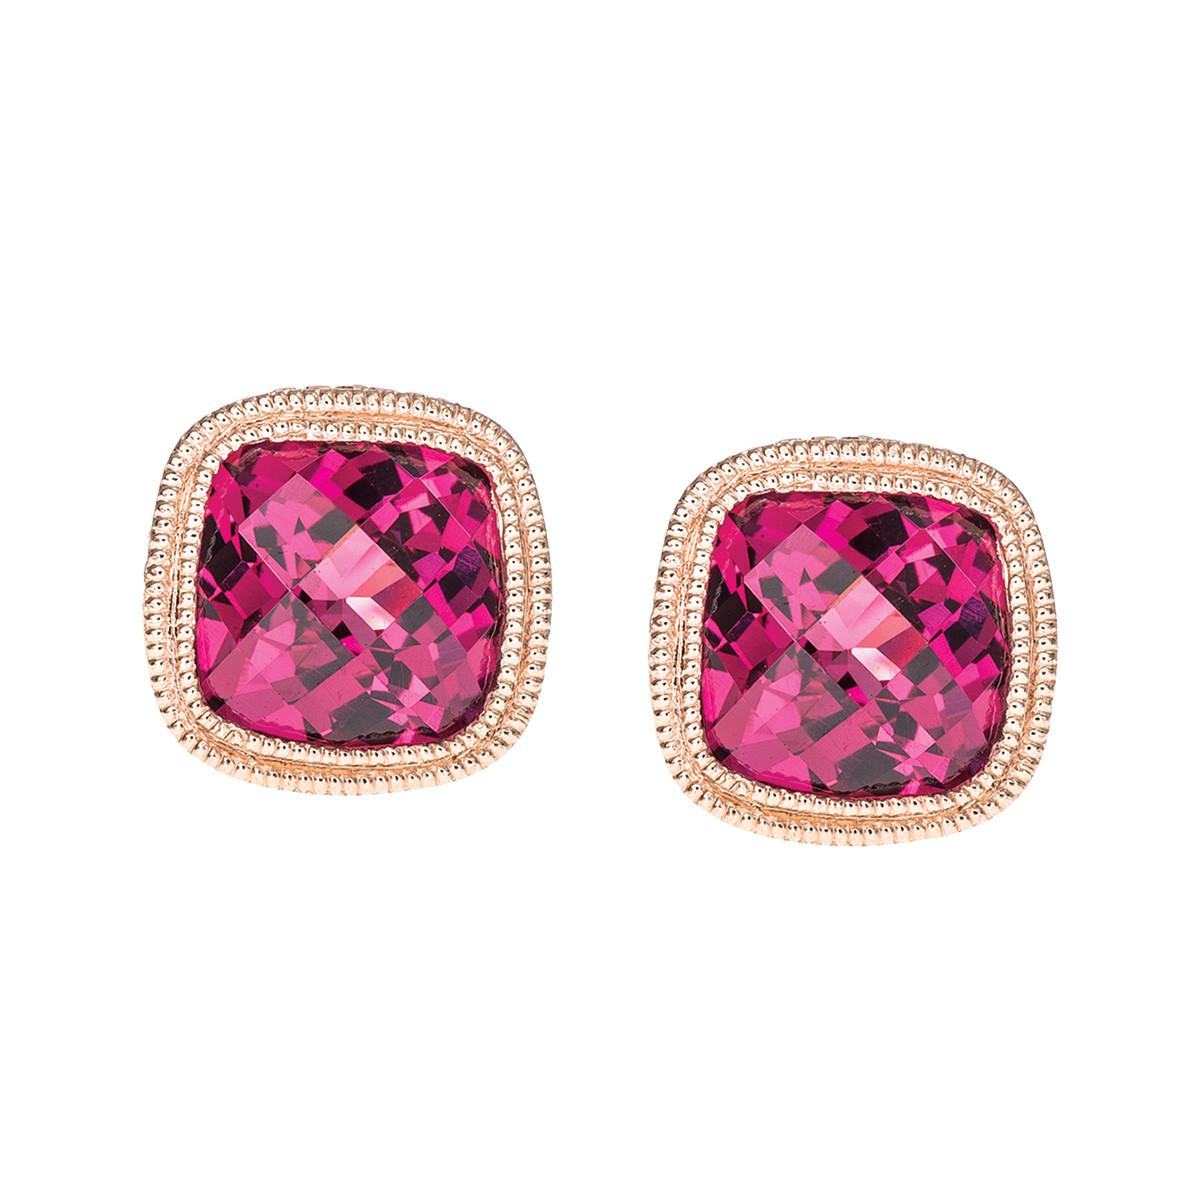 2.30 CTW Rhodolite Garnet Earrings